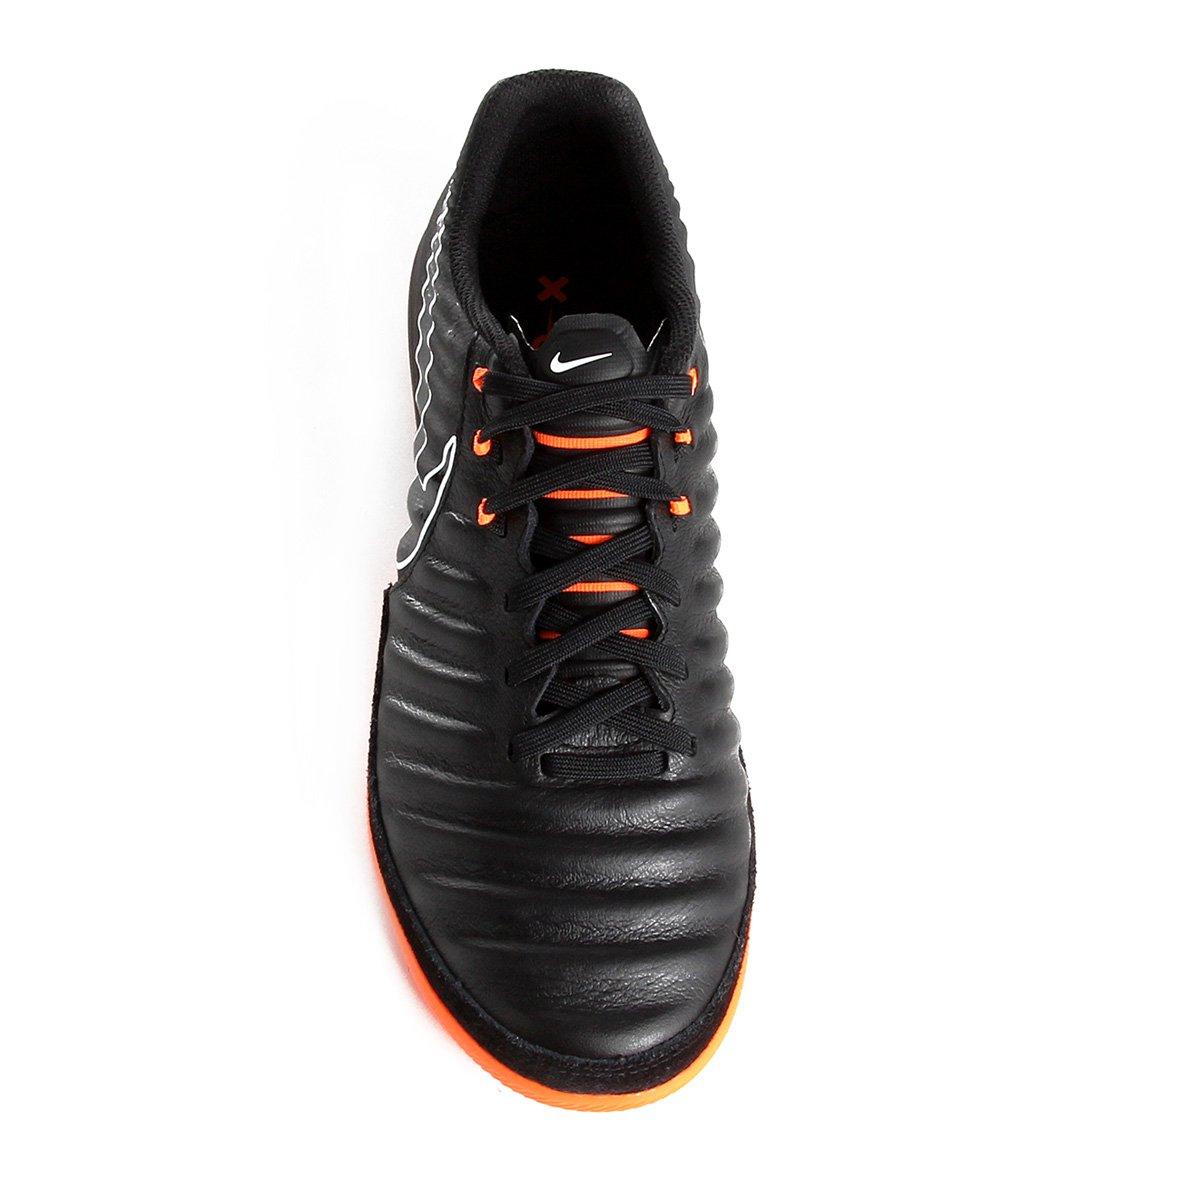 3e393f1839 Chuteira Futsal Nike Tiempo Lunar Legend 7 Pro IC - Compre Agora ...